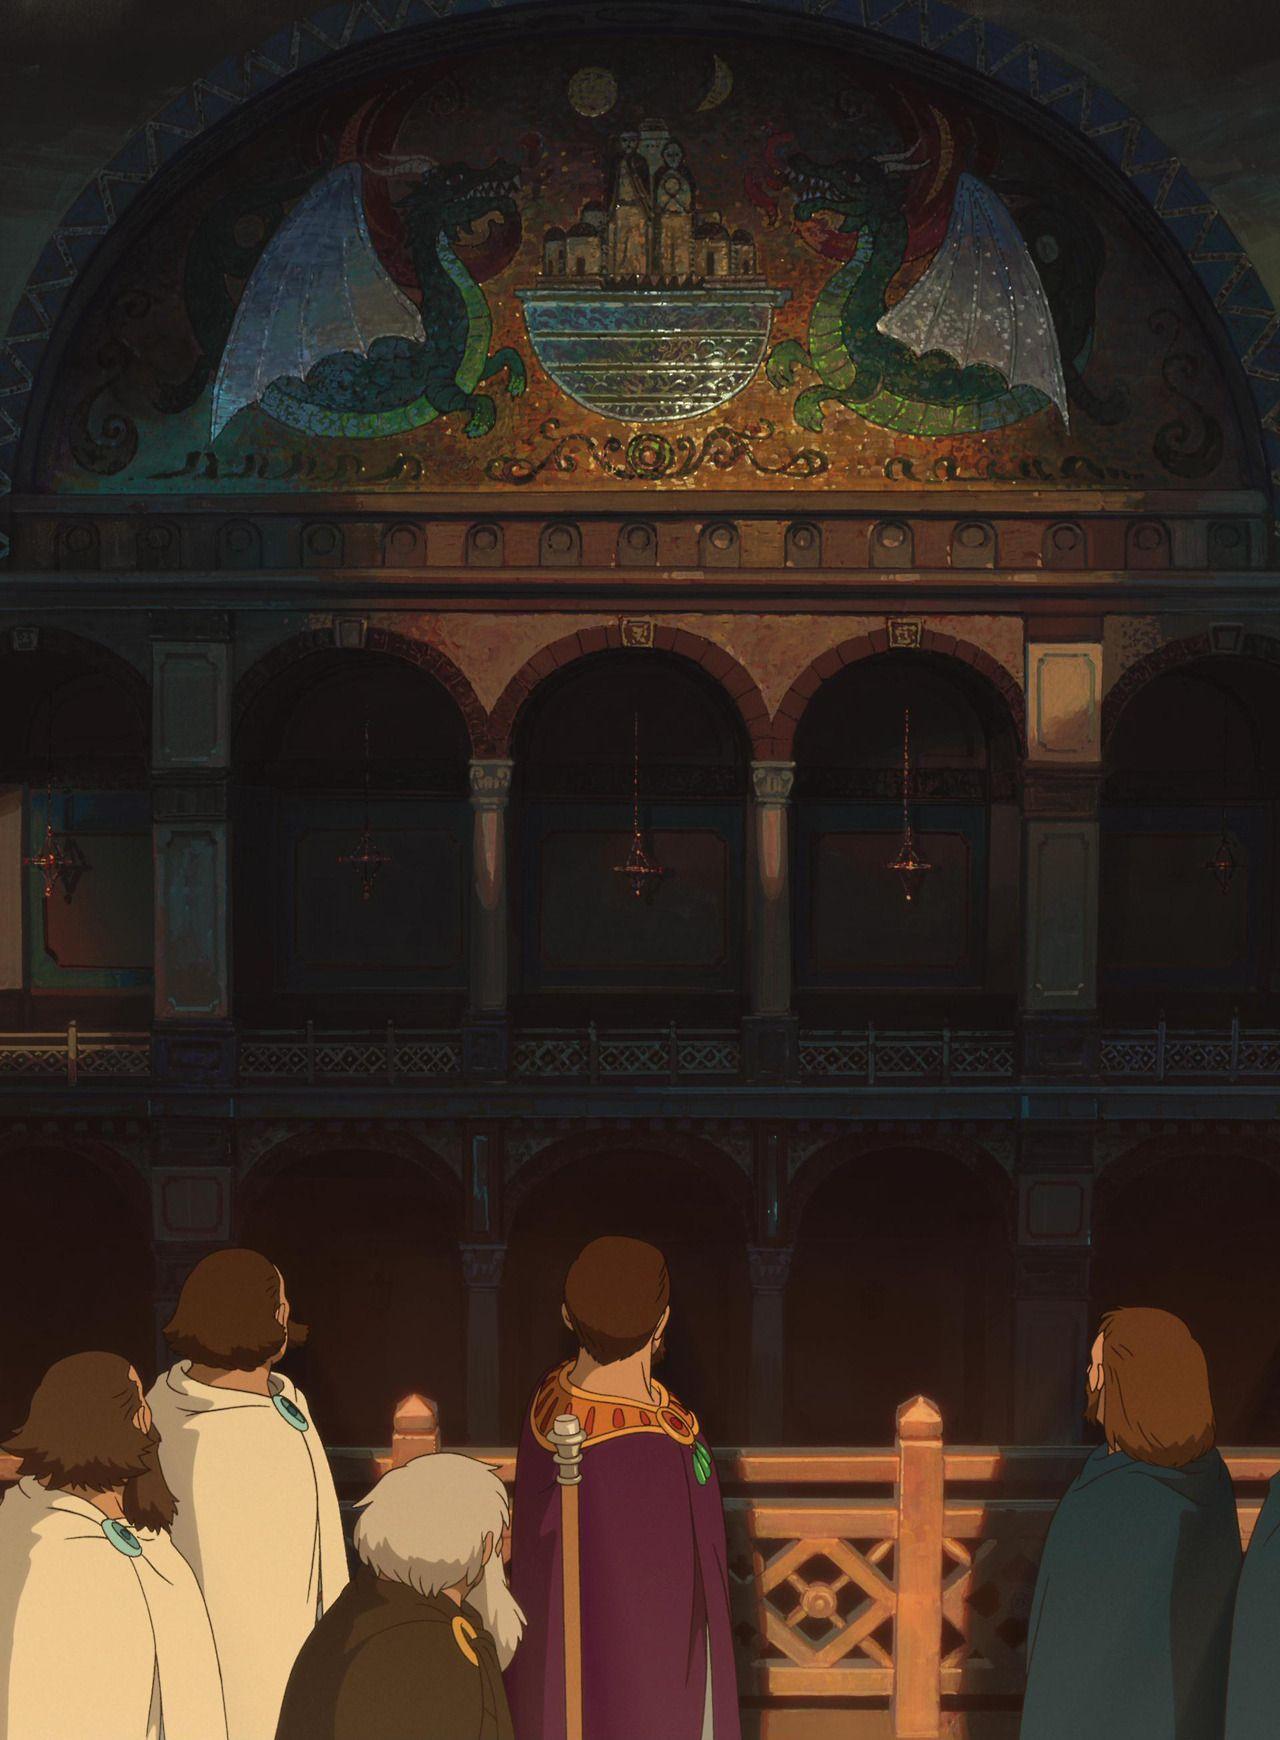 Tales From Eathsea. Directed by Gorō Miyazaki and produced by Studio Ghibli.